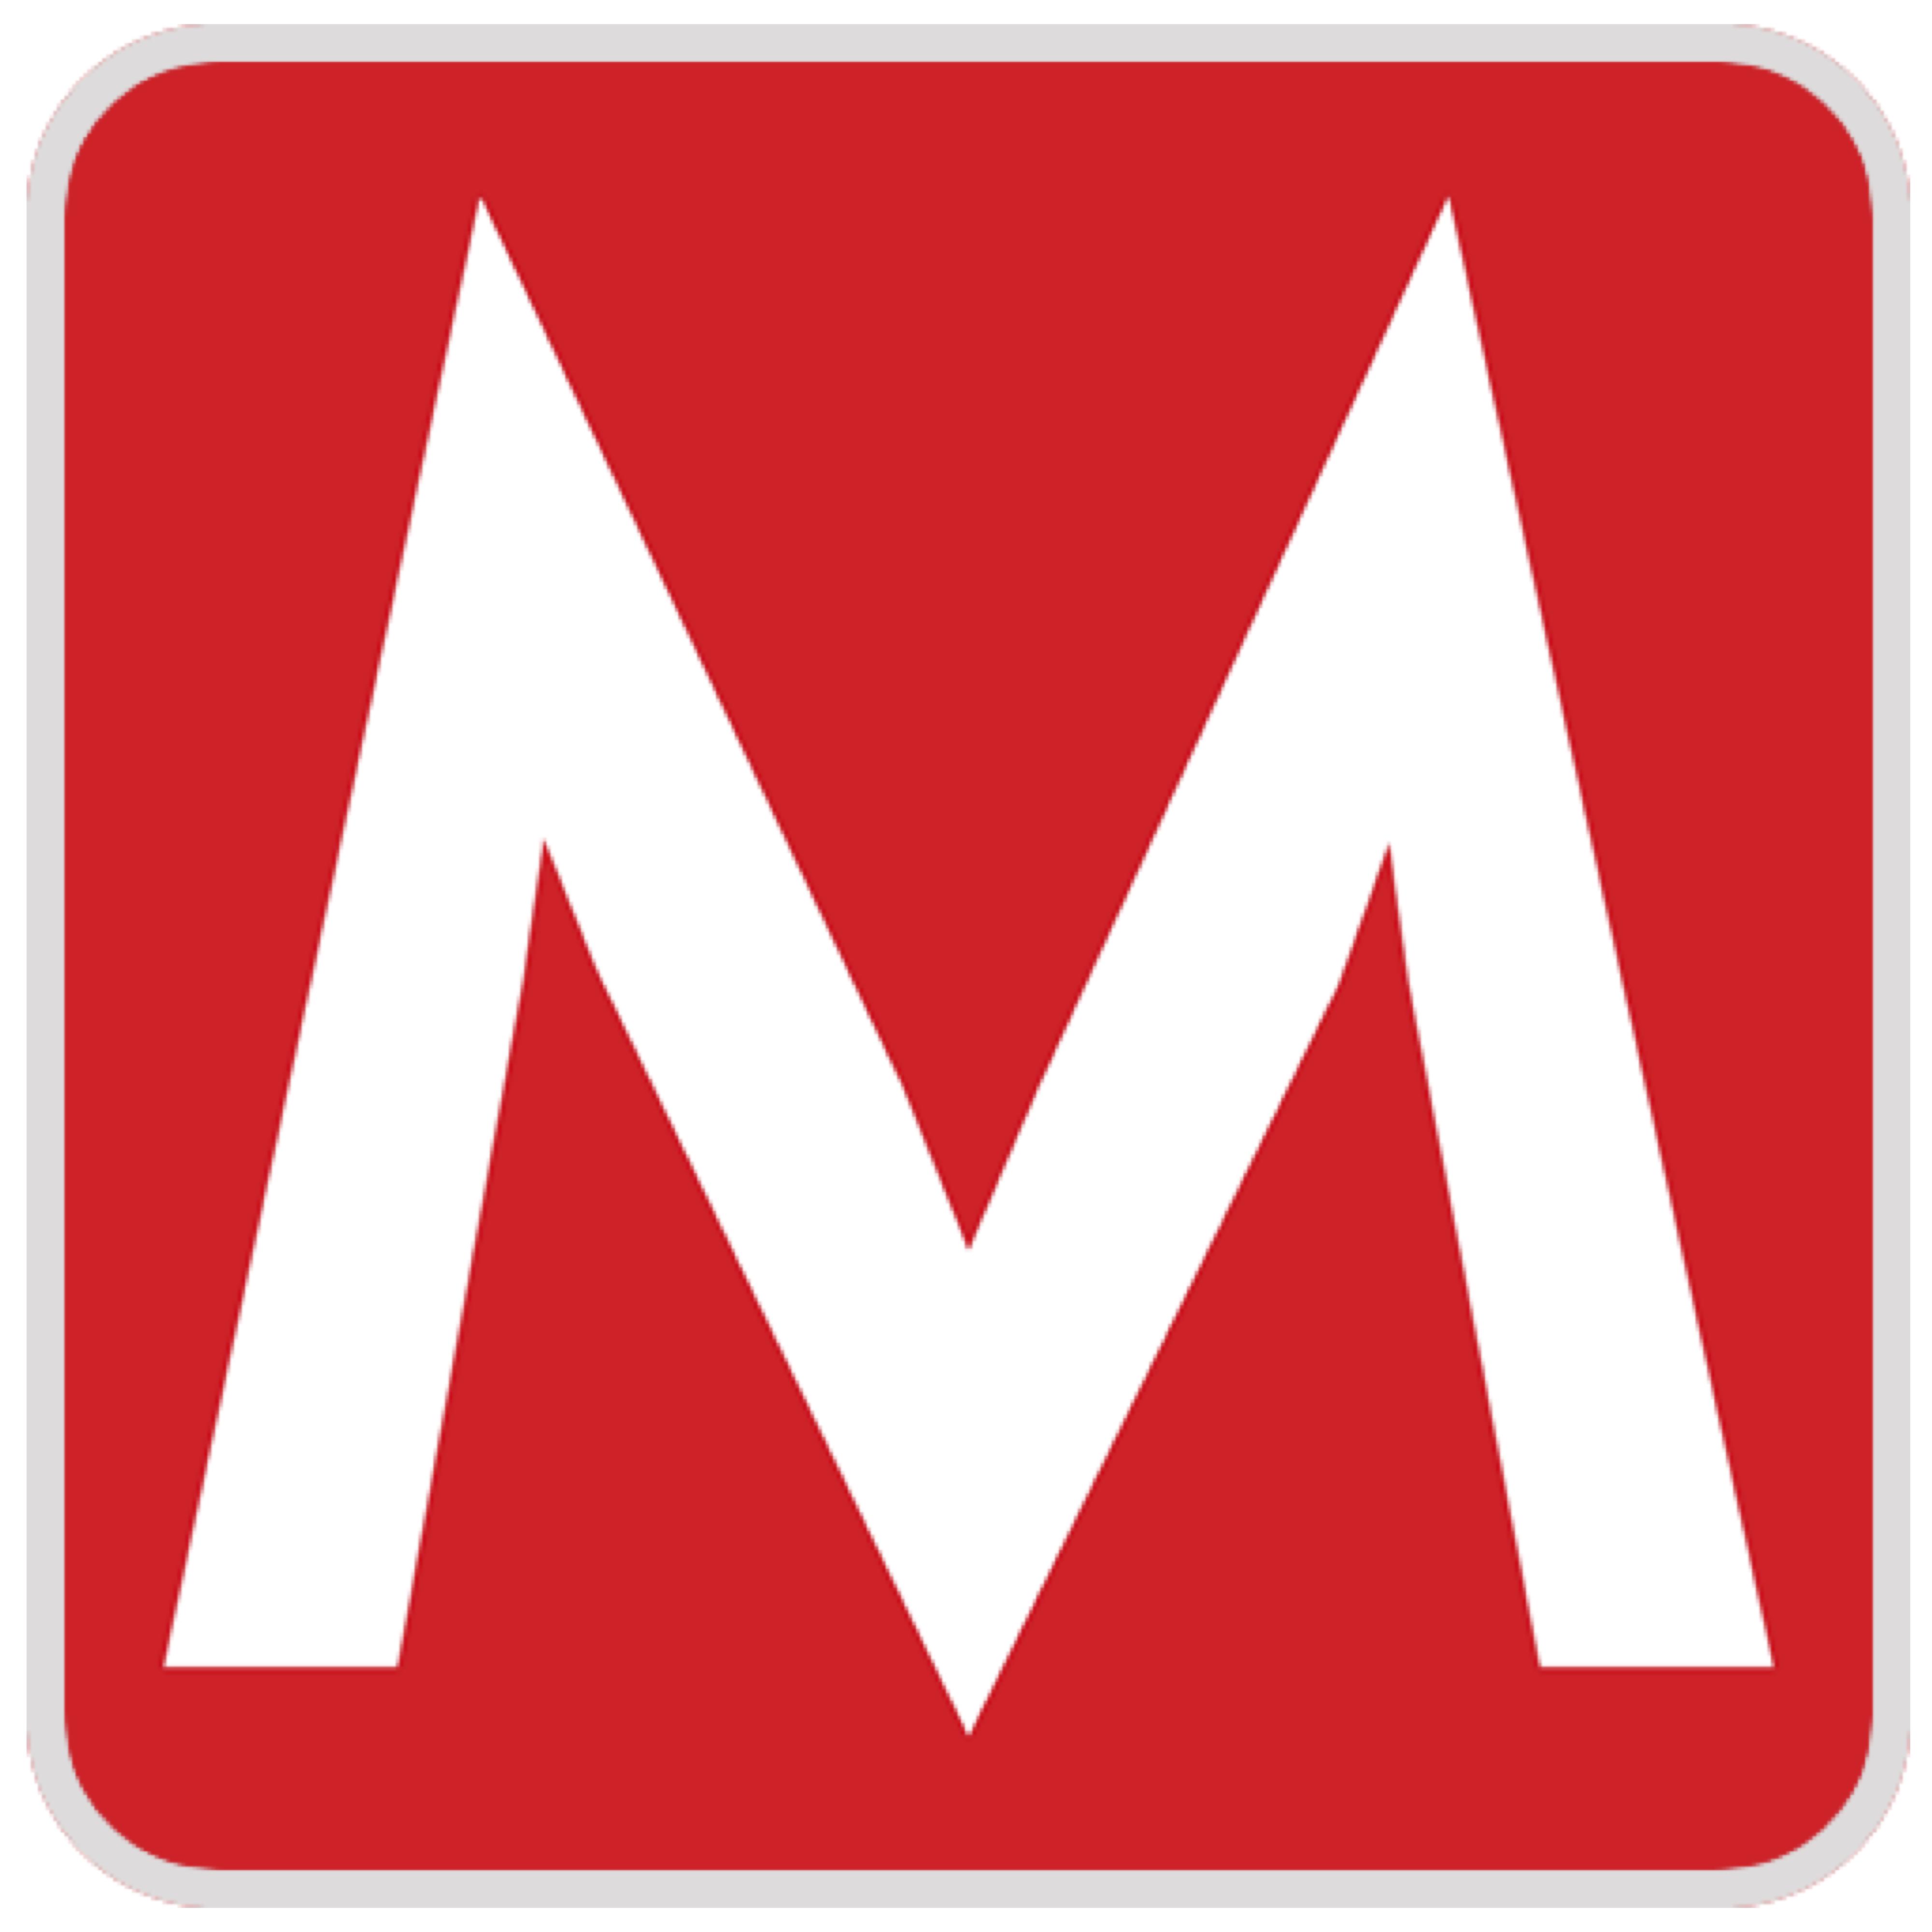 MM Square